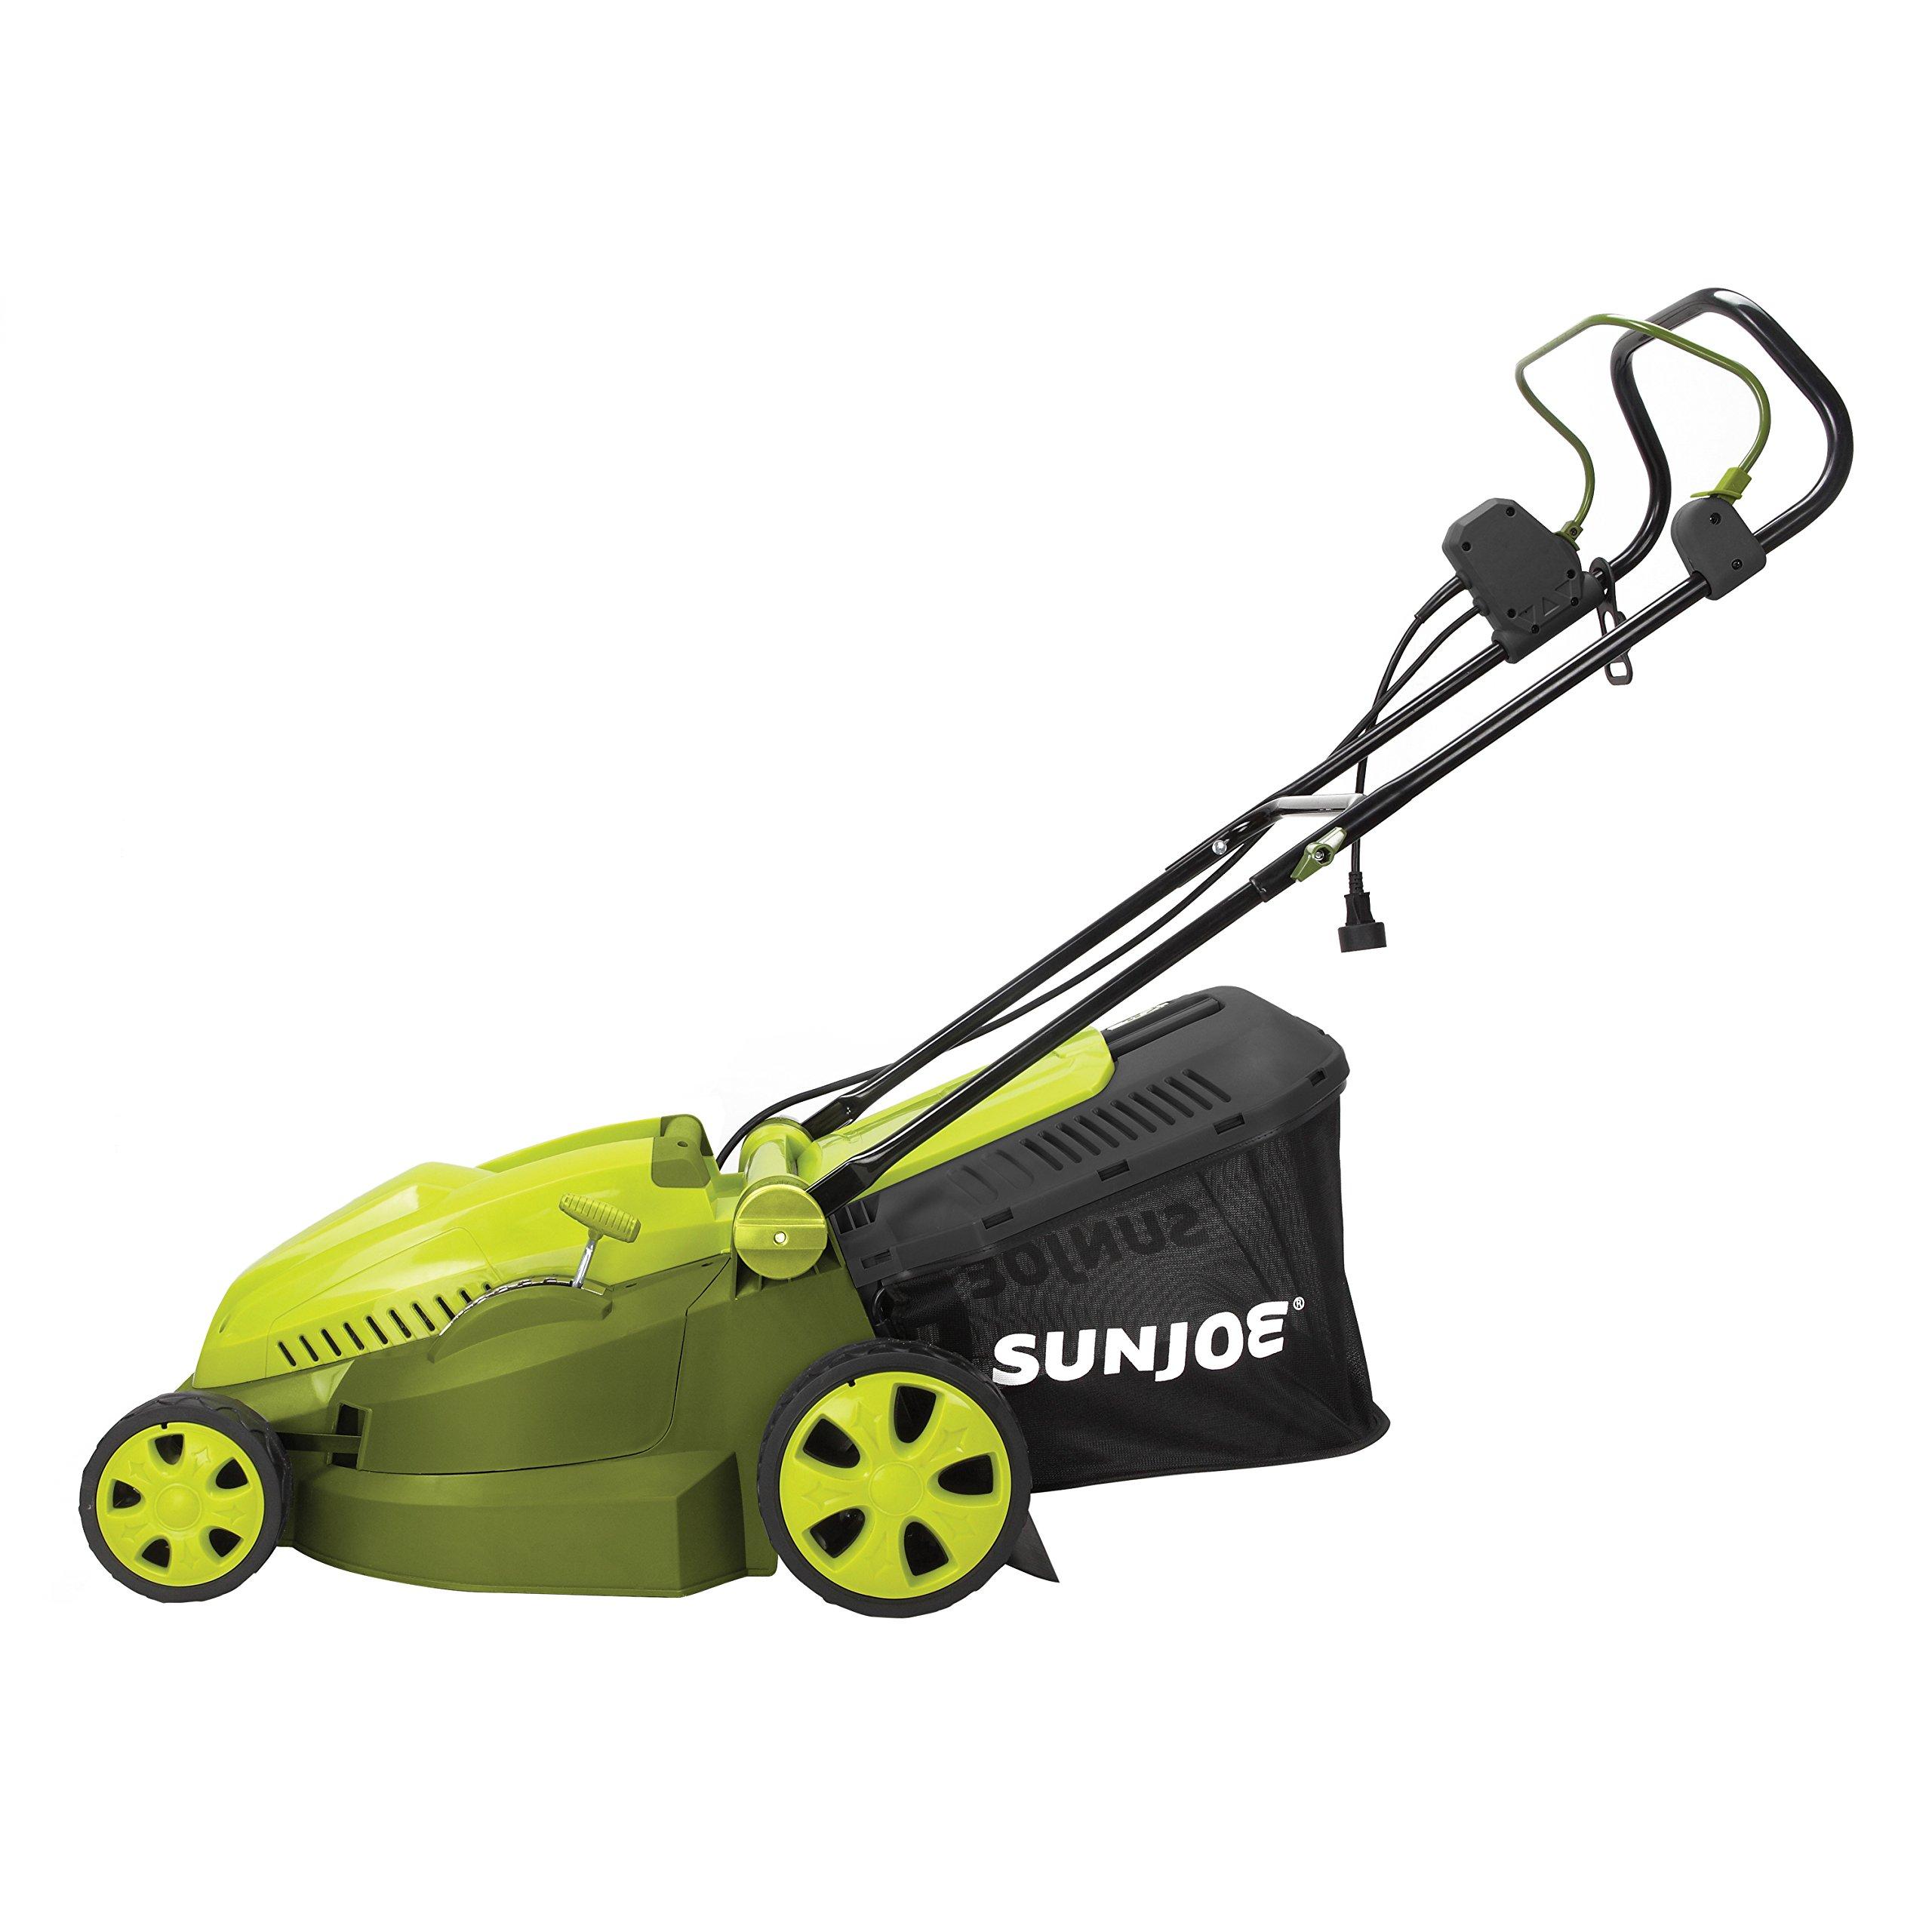 Sun Joe MJ402E Electric Lawn Mower   16 inch   12 Amp by Sun Joe